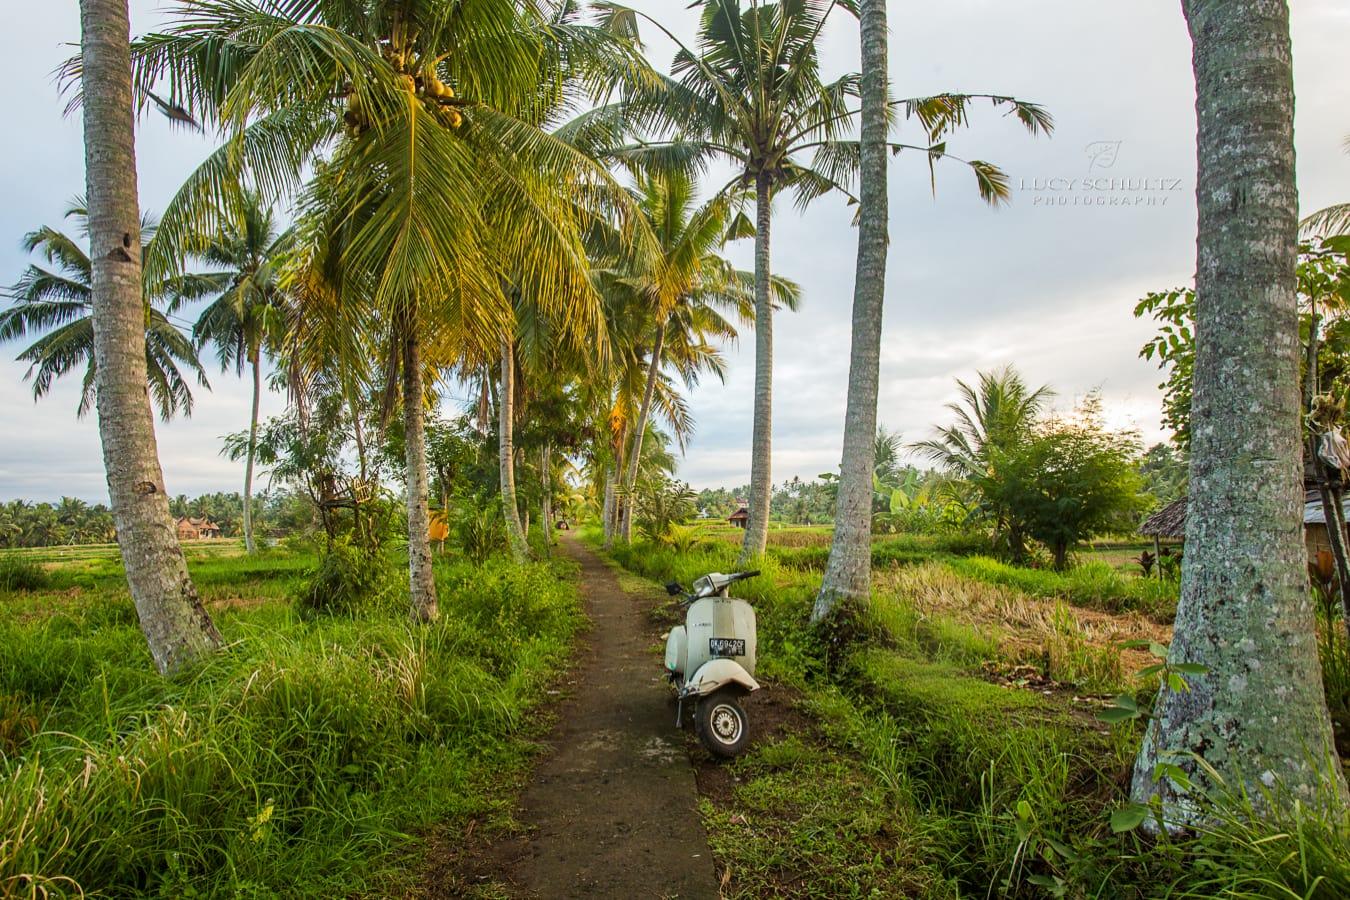 Adventures in Bali 4: Tanah Lot, Uluwatu, Ubud & Padangbai – Travel Photographer